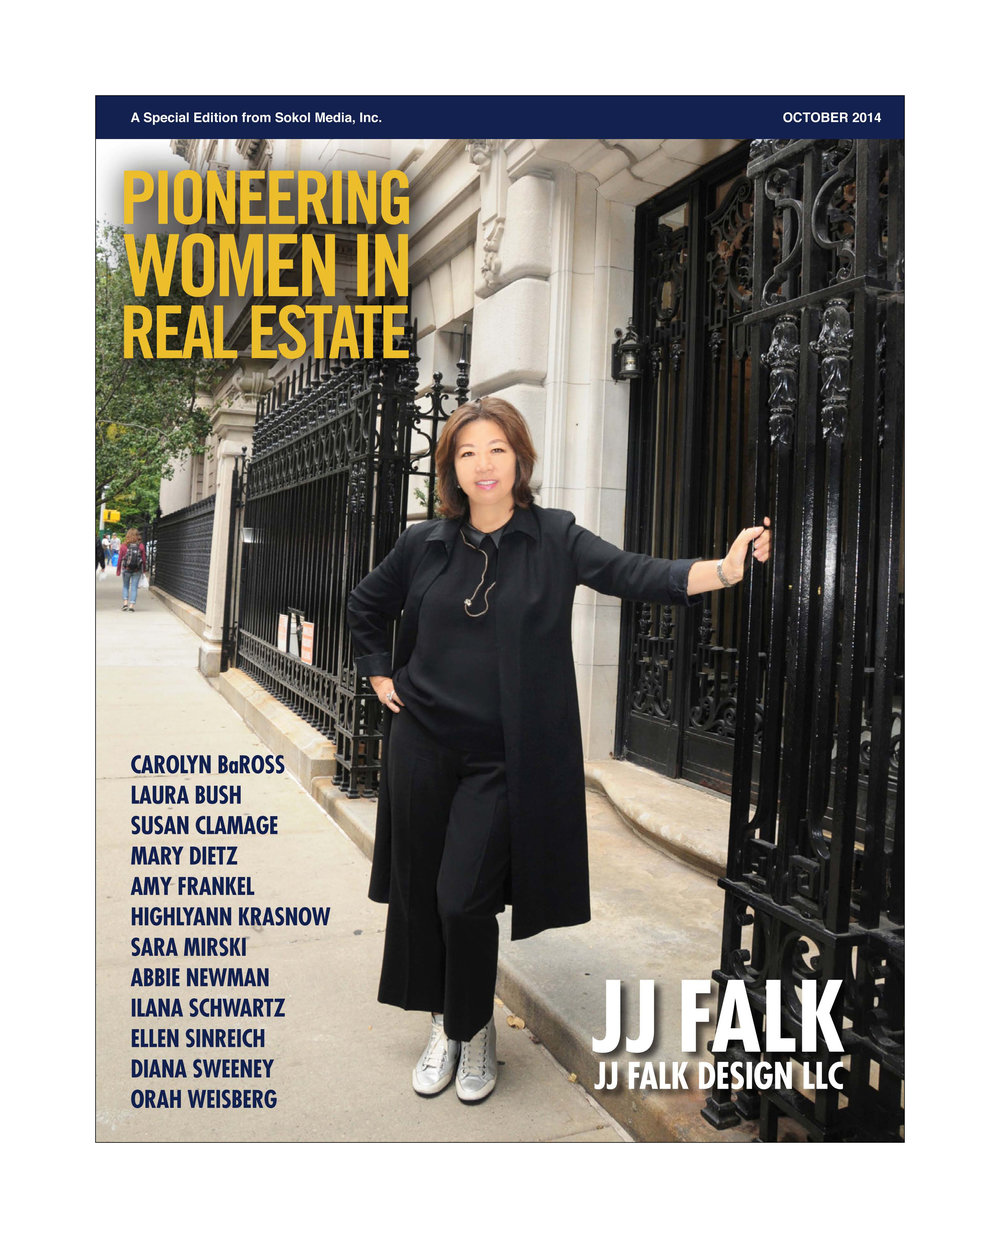 2014 Pioneering Women in Real Estate